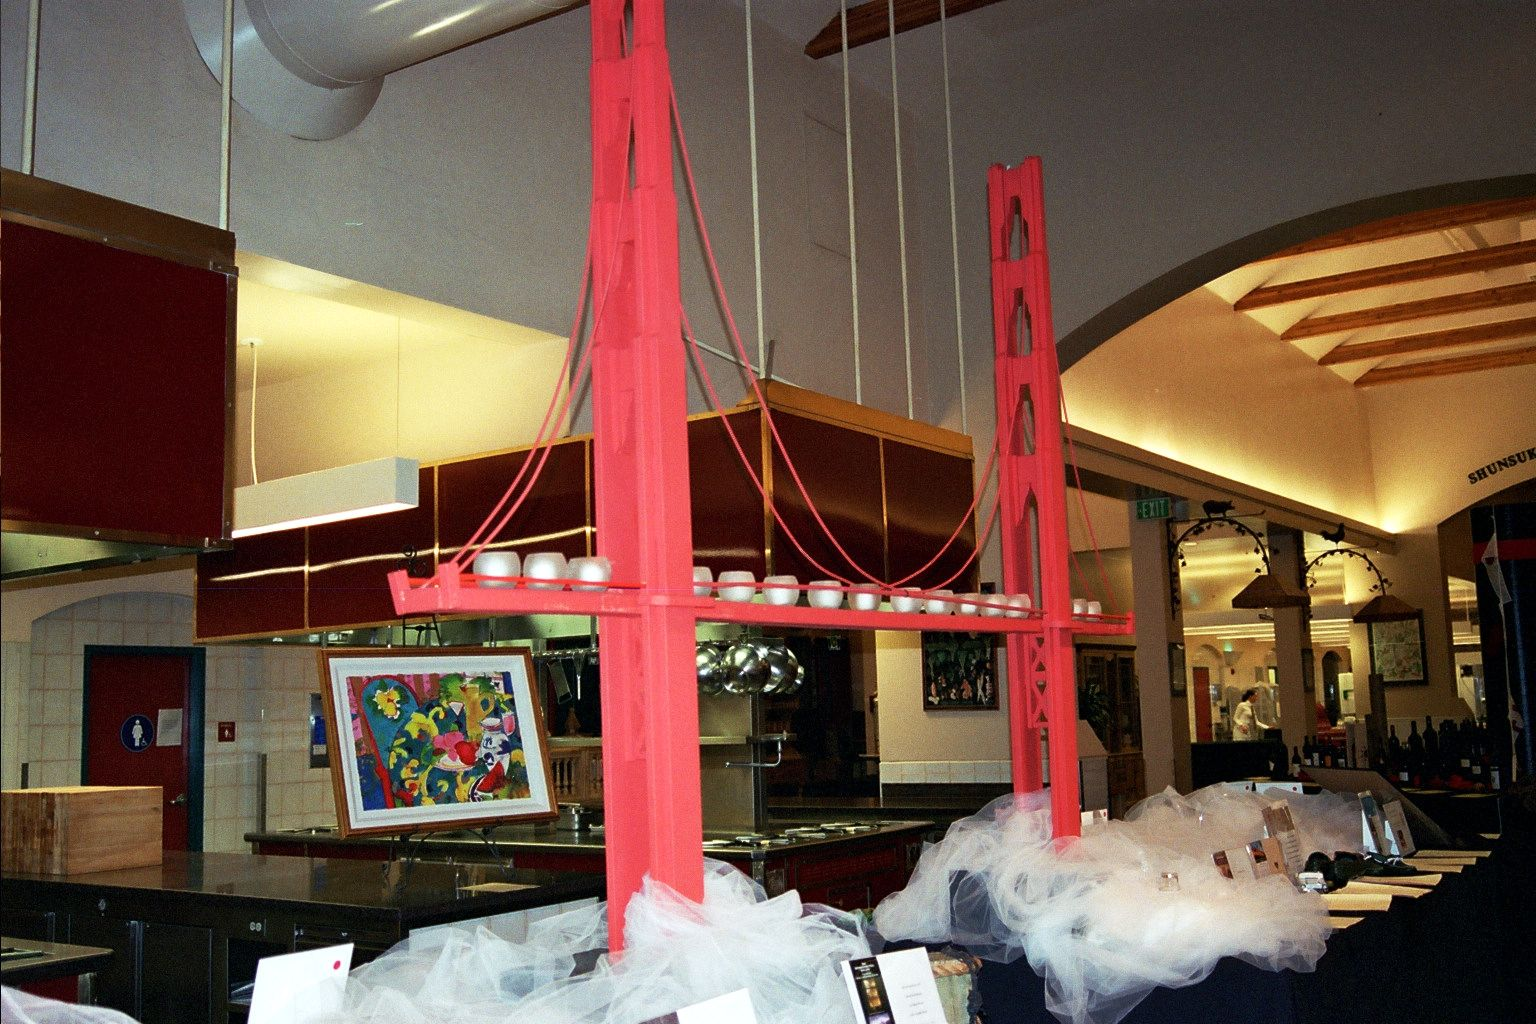 San Francisco theme using Golden Gate